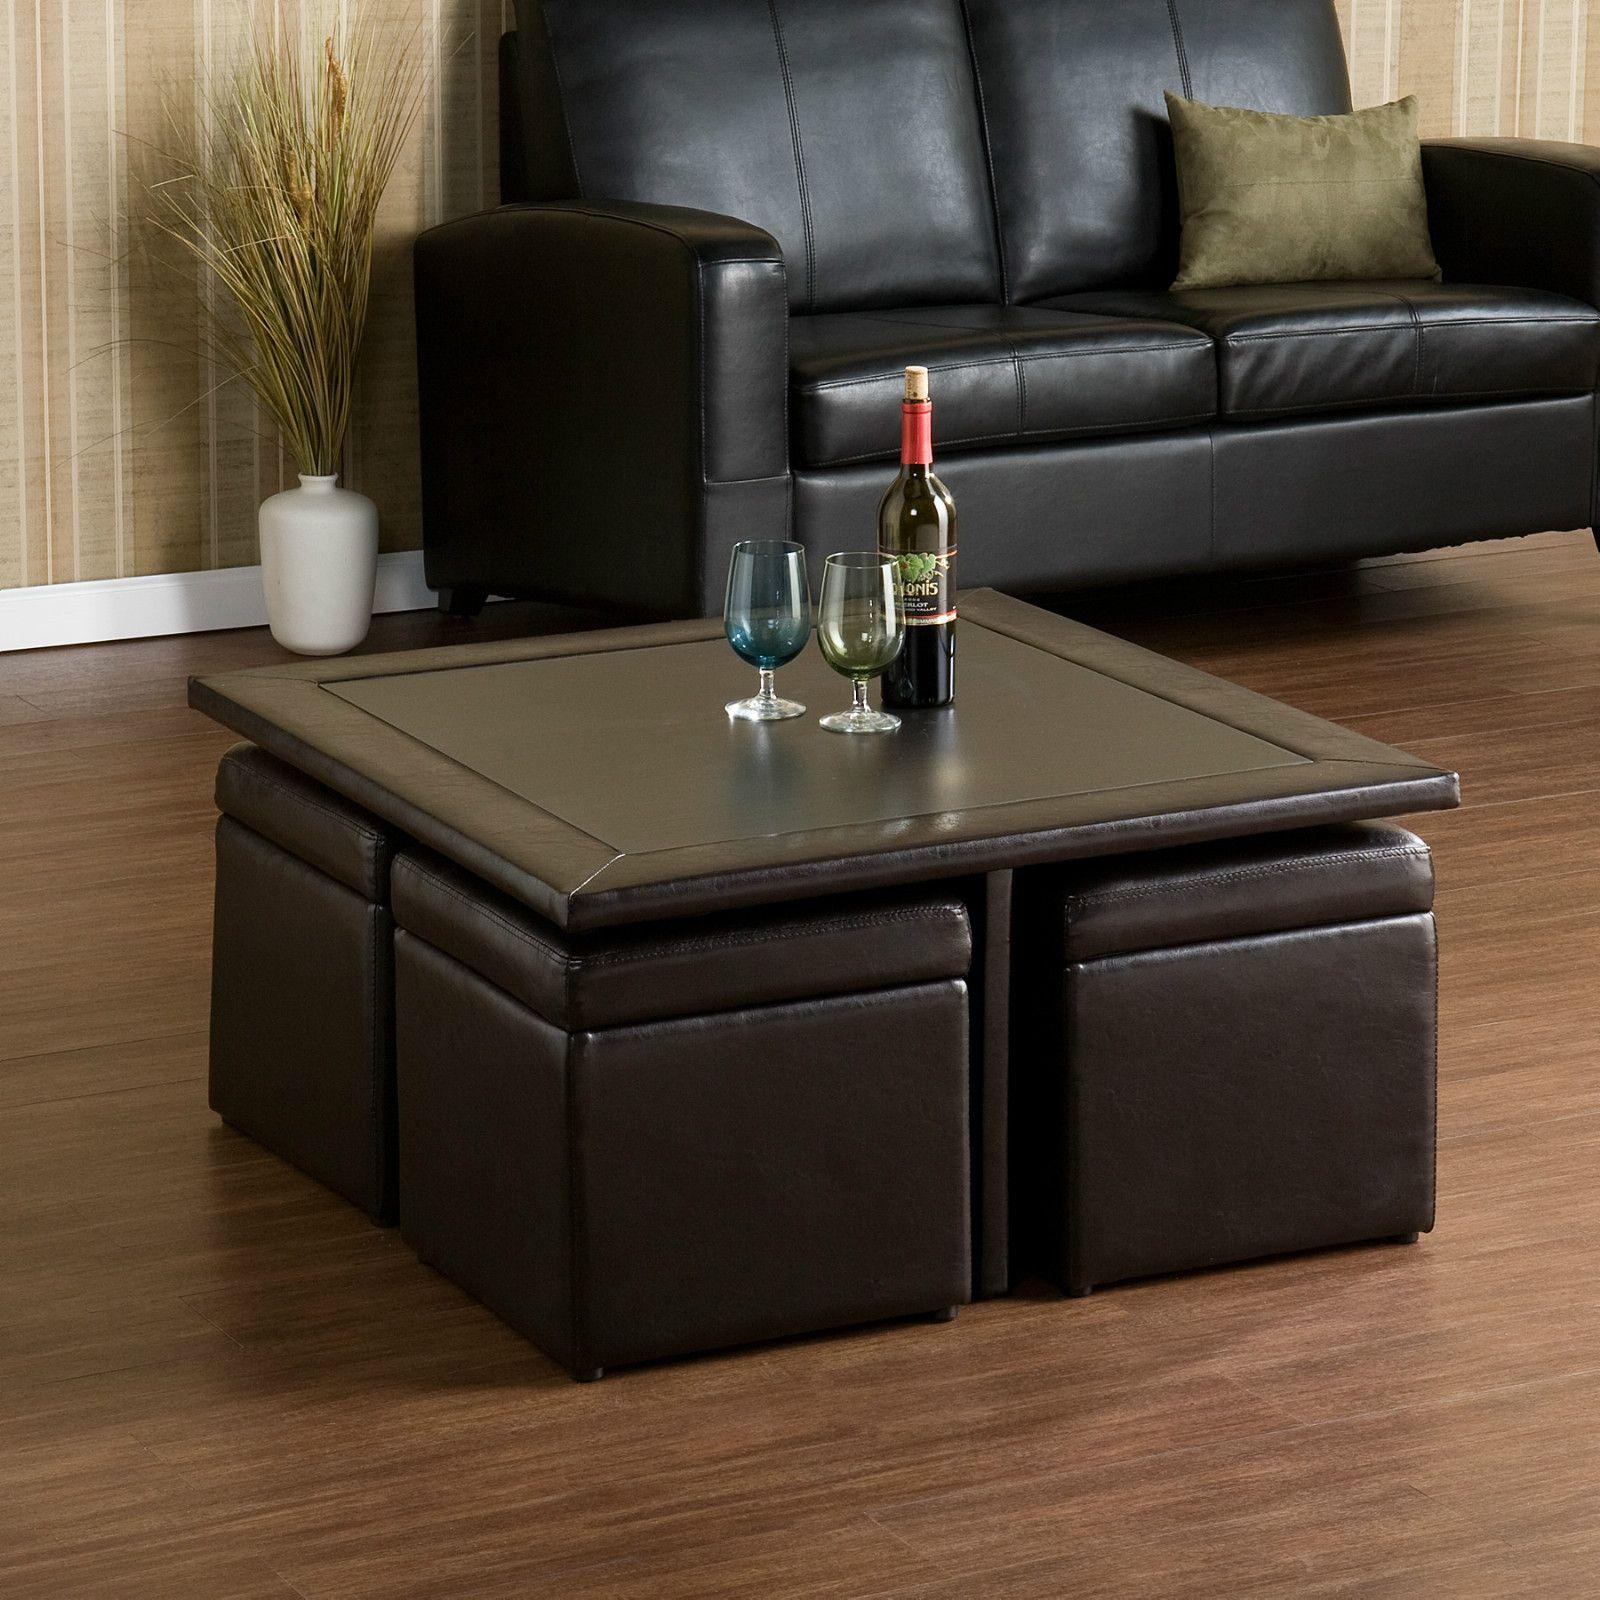 Nylo Storage Cube Cocktail Table Set W 4 Ottoman Seats Chocolate Sei Ck4045s Cube Coffee Table Coffee Table Coffee Table Square [ 1600 x 1600 Pixel ]